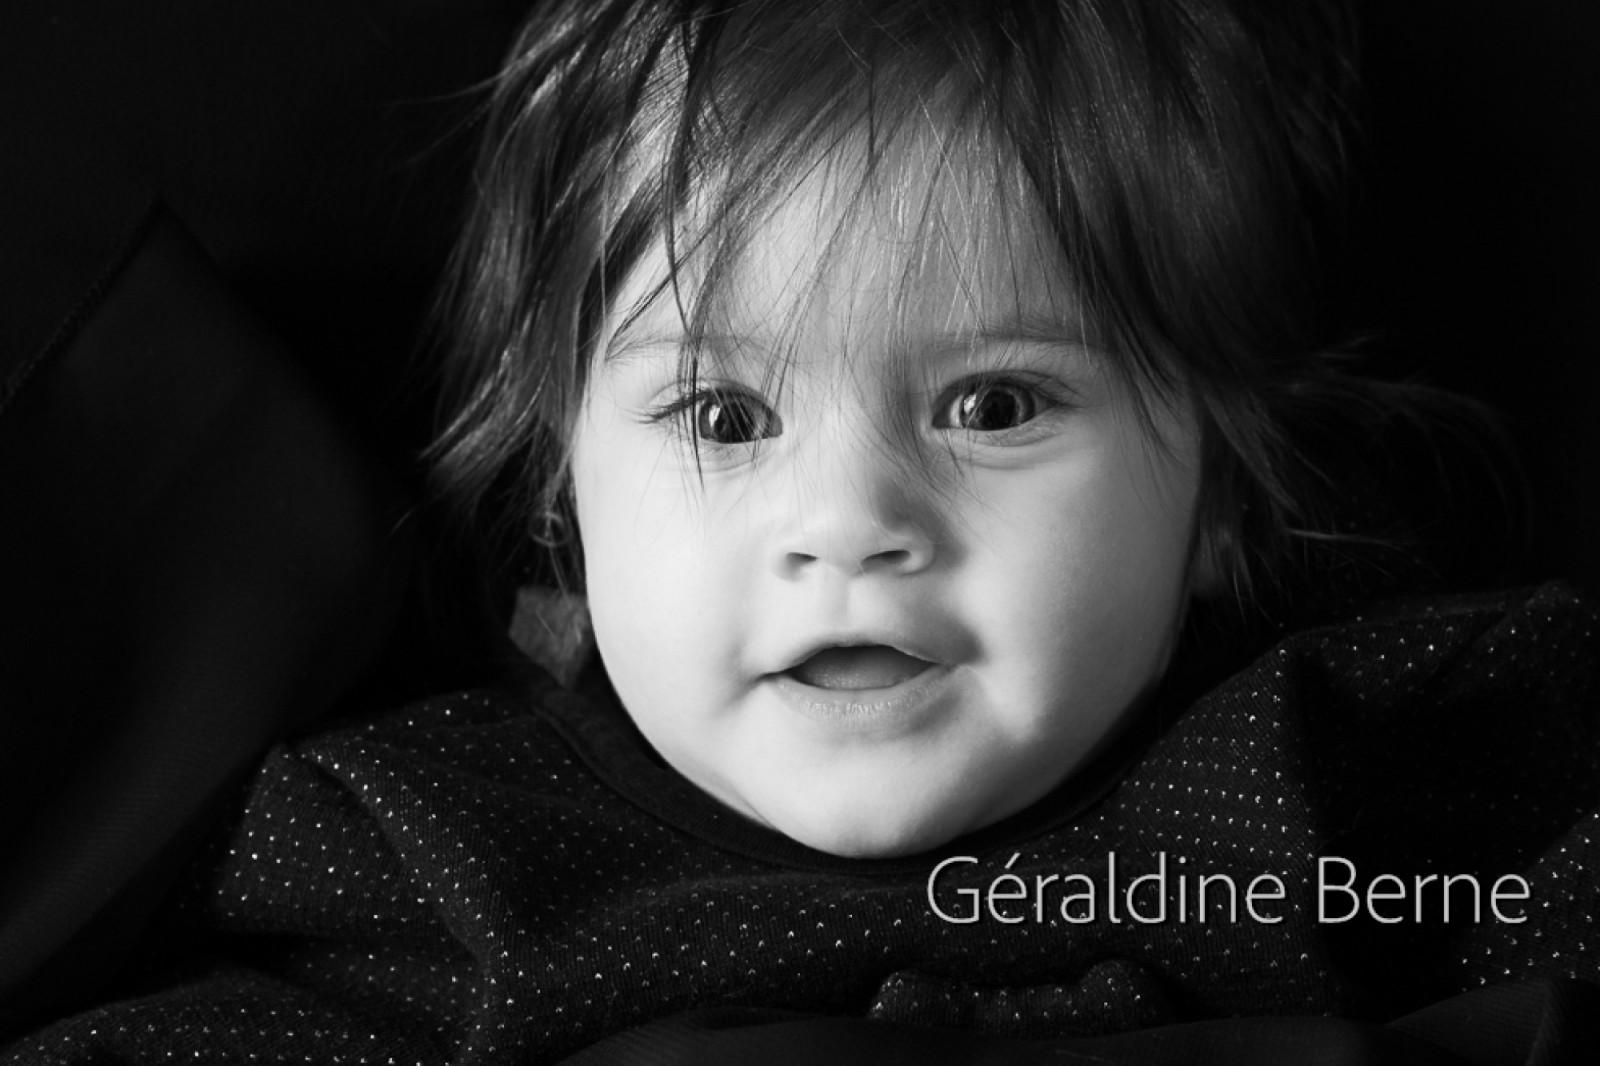 geraldine-berne 3141b00f4d37